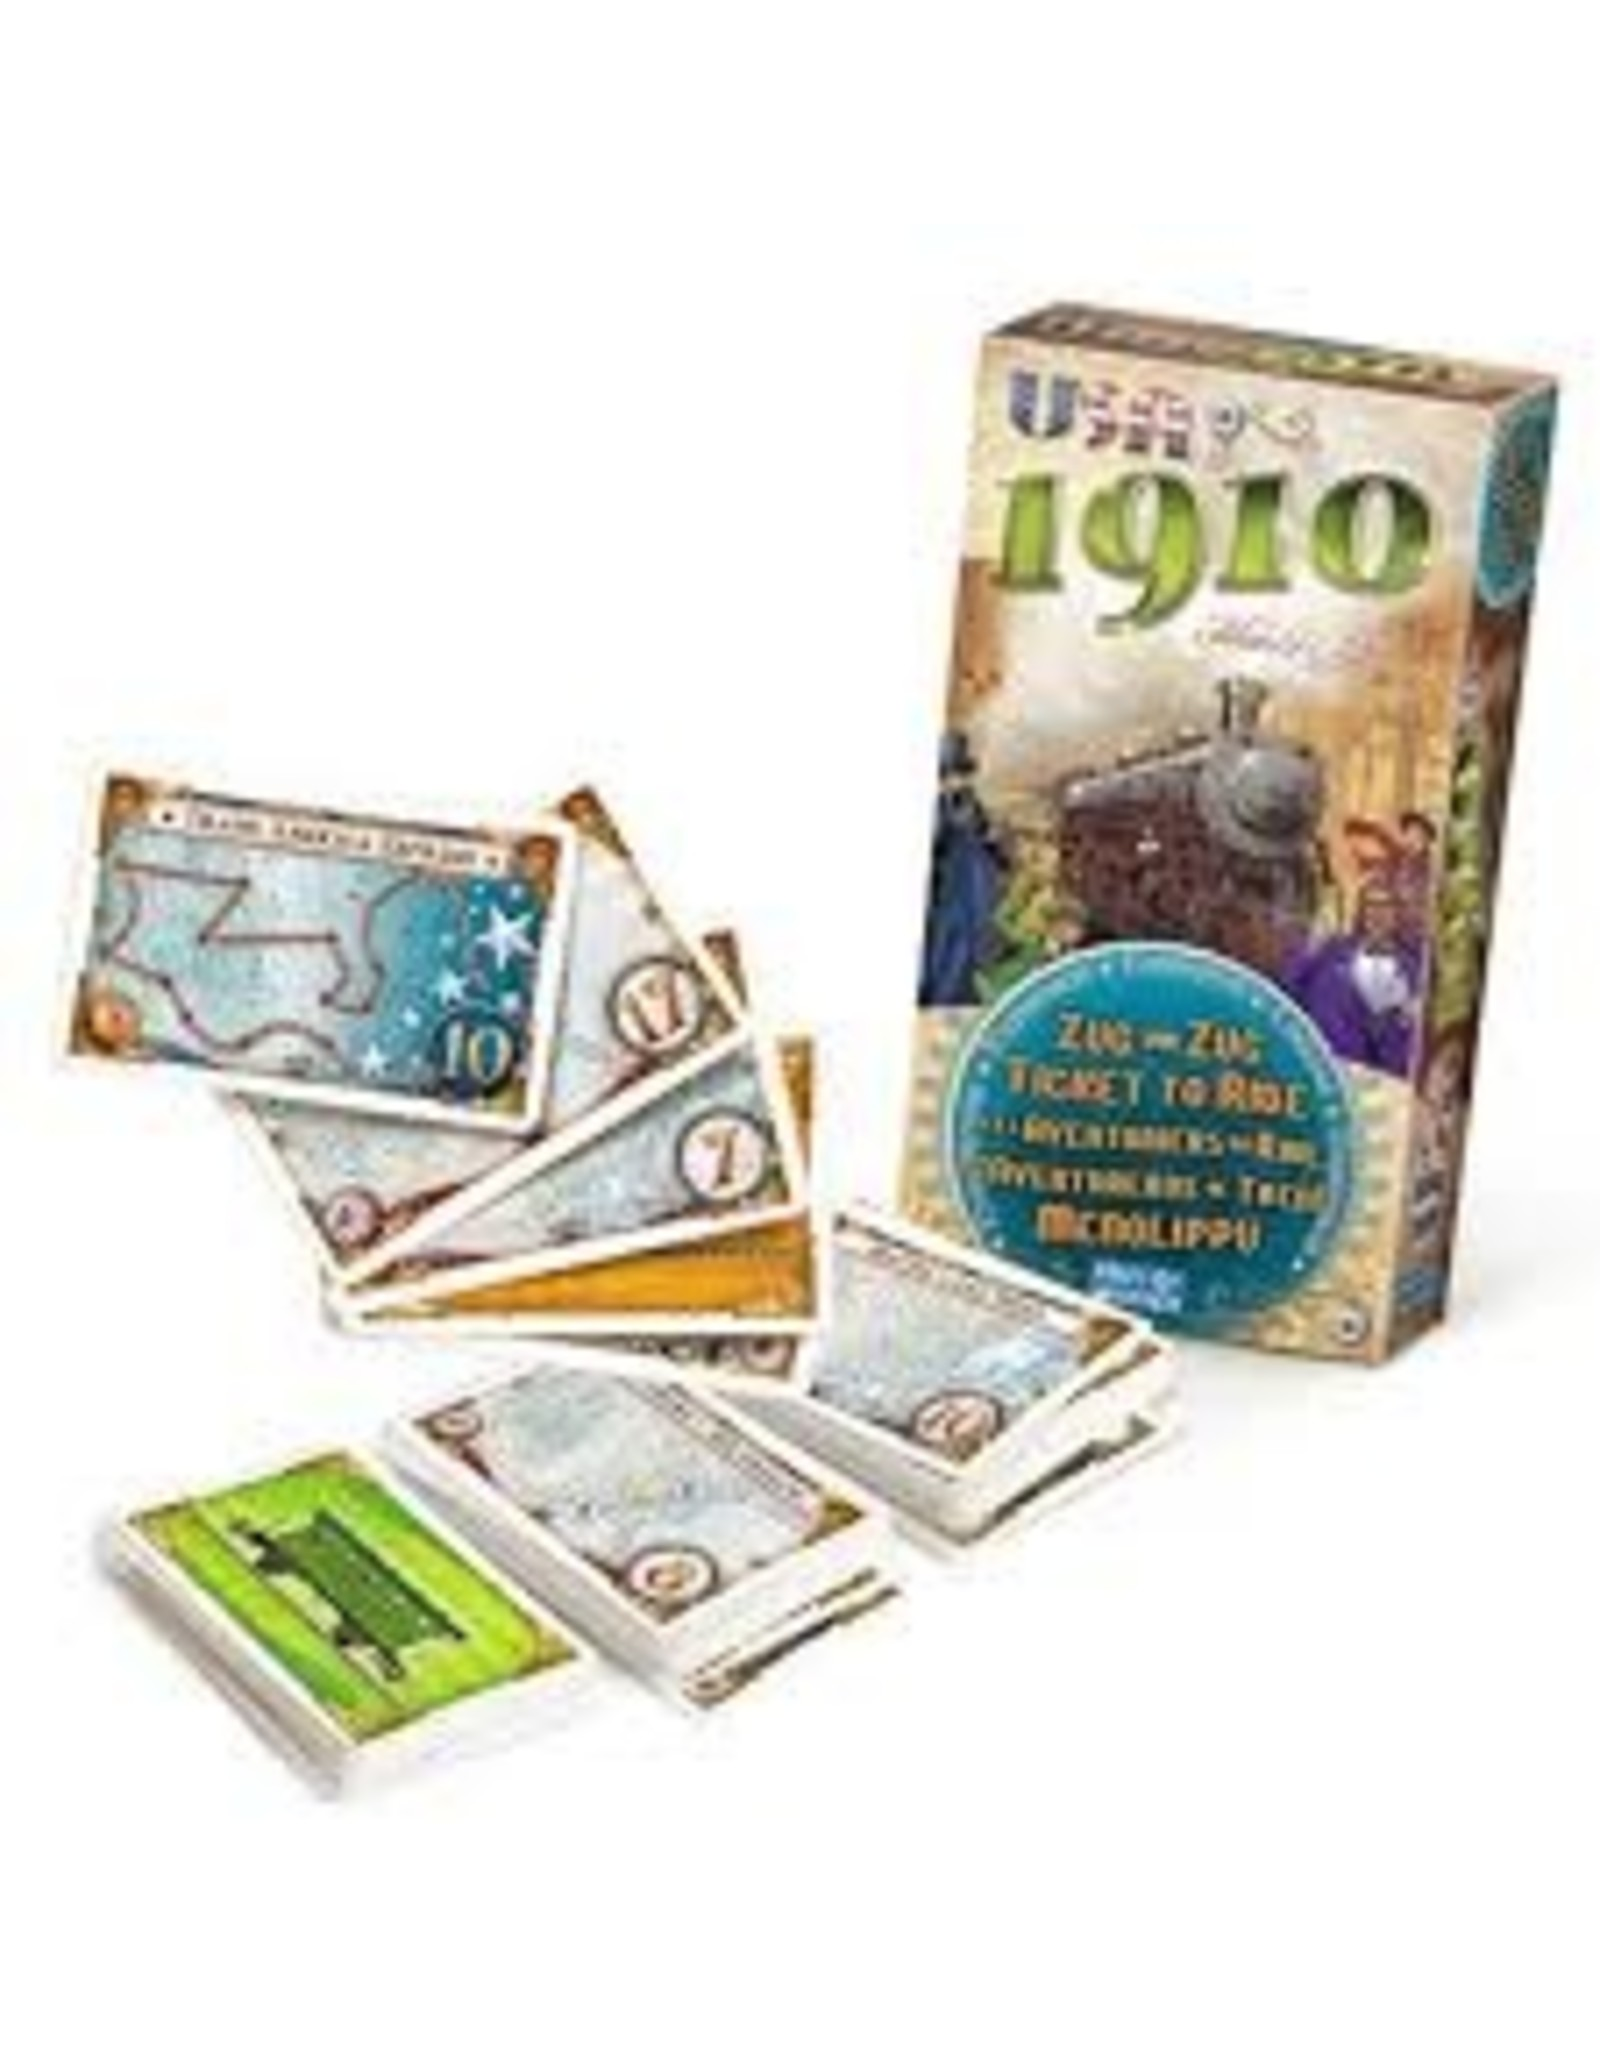 Days of Wonder Ticket To Ride: Usa - 1910 Expansion